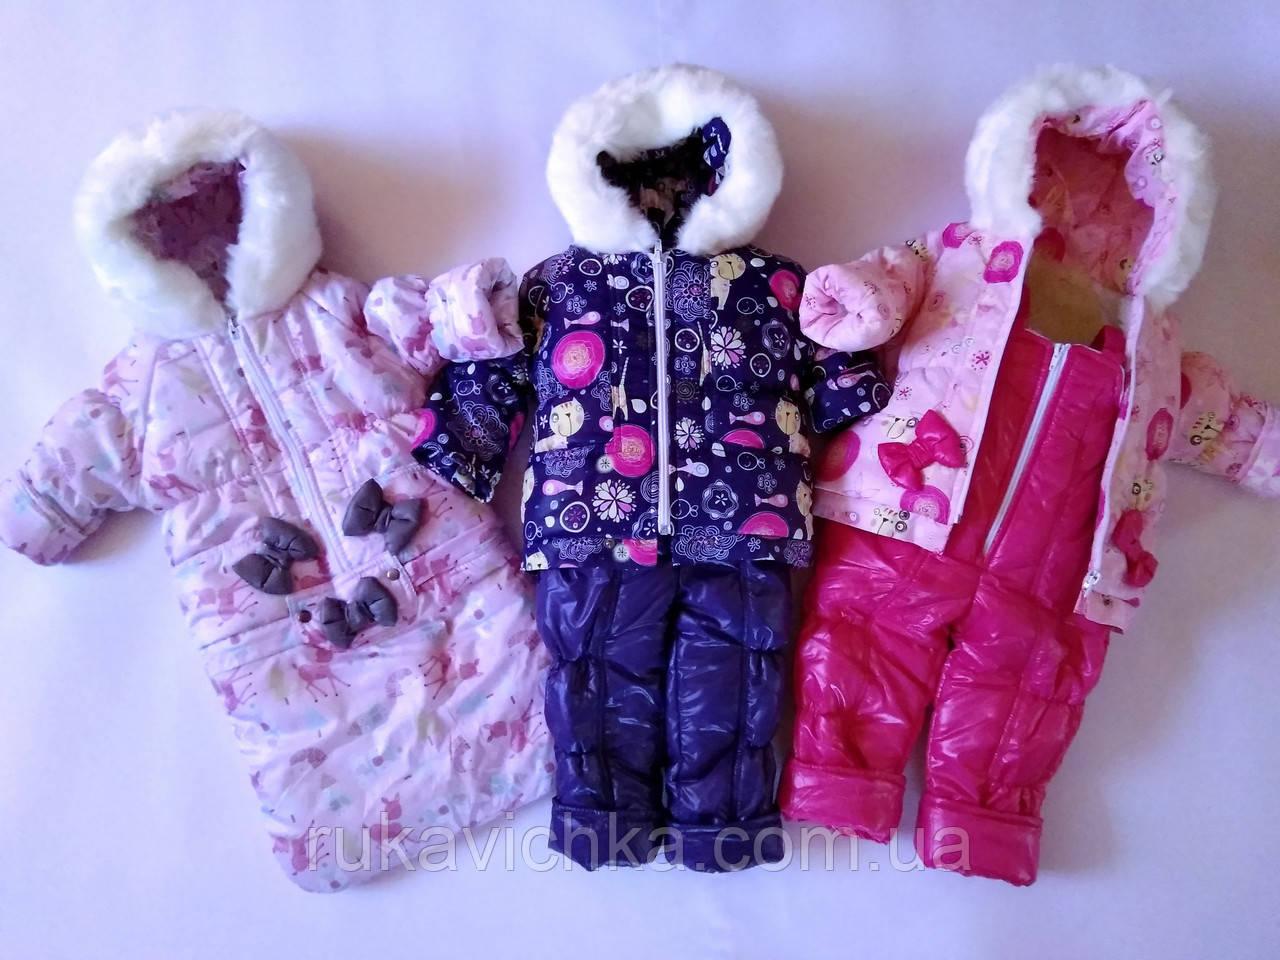 Зимний комбинезон тройка на овчине (куртка конверт полукомбинезон) для  девочки (р. 60-86) c224816a3b6b4